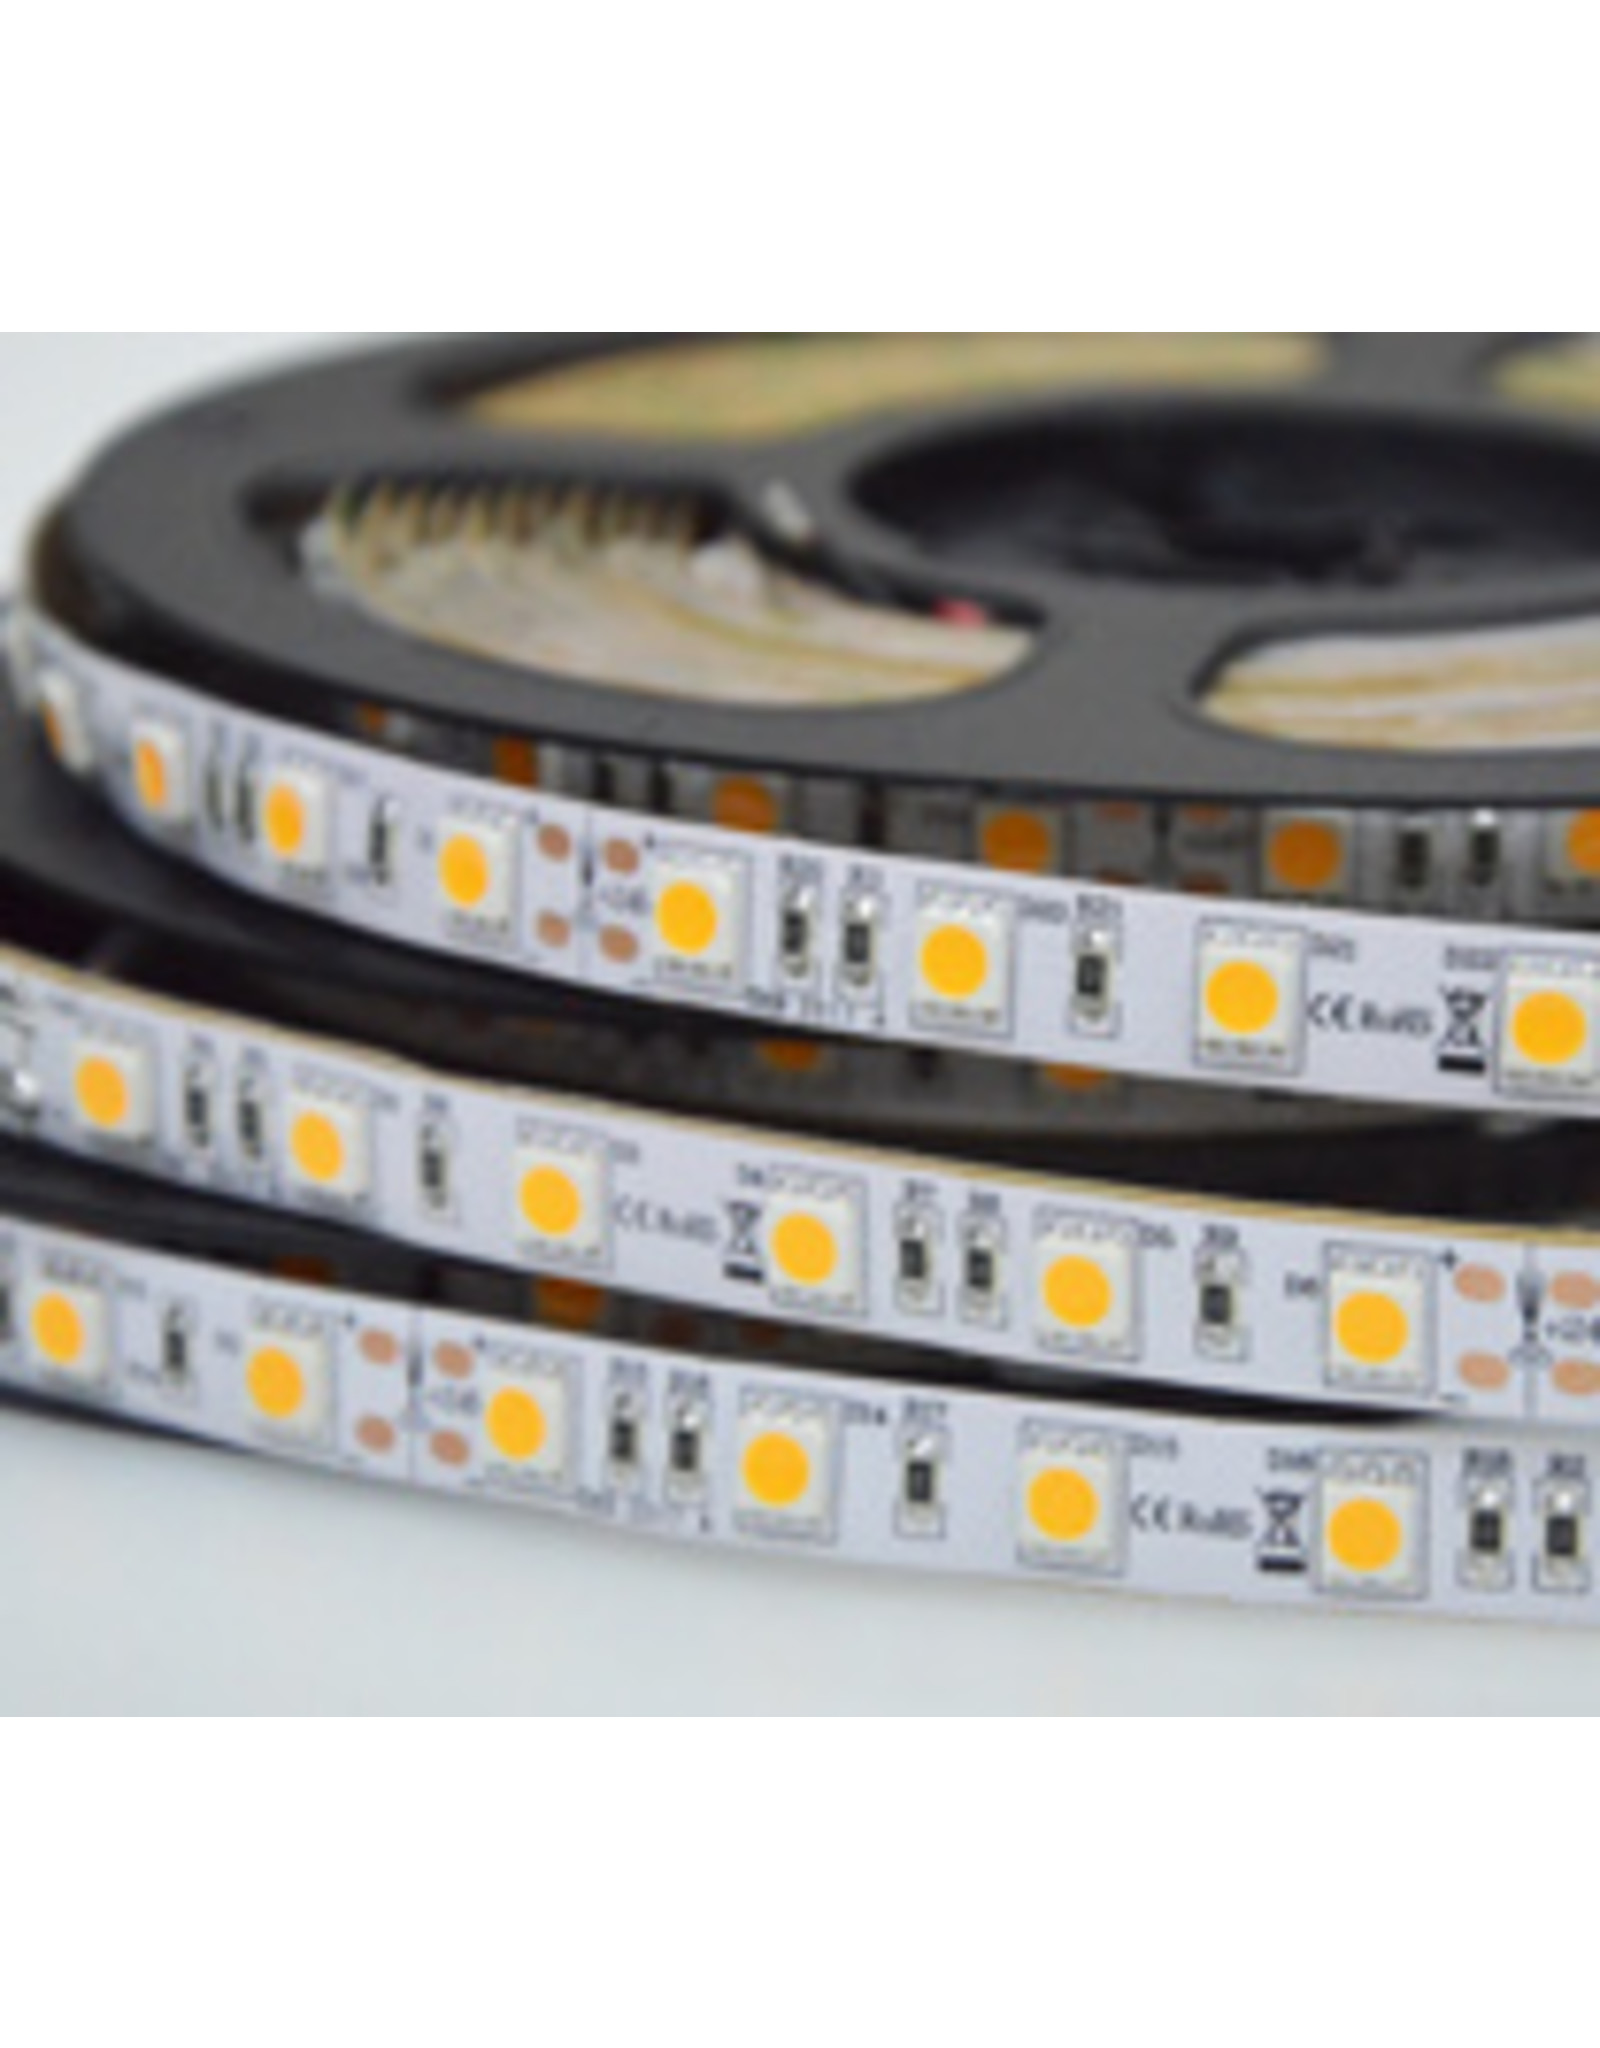 Lights Ledstrip 24v, 70w/5m, cold white 6000-6500k